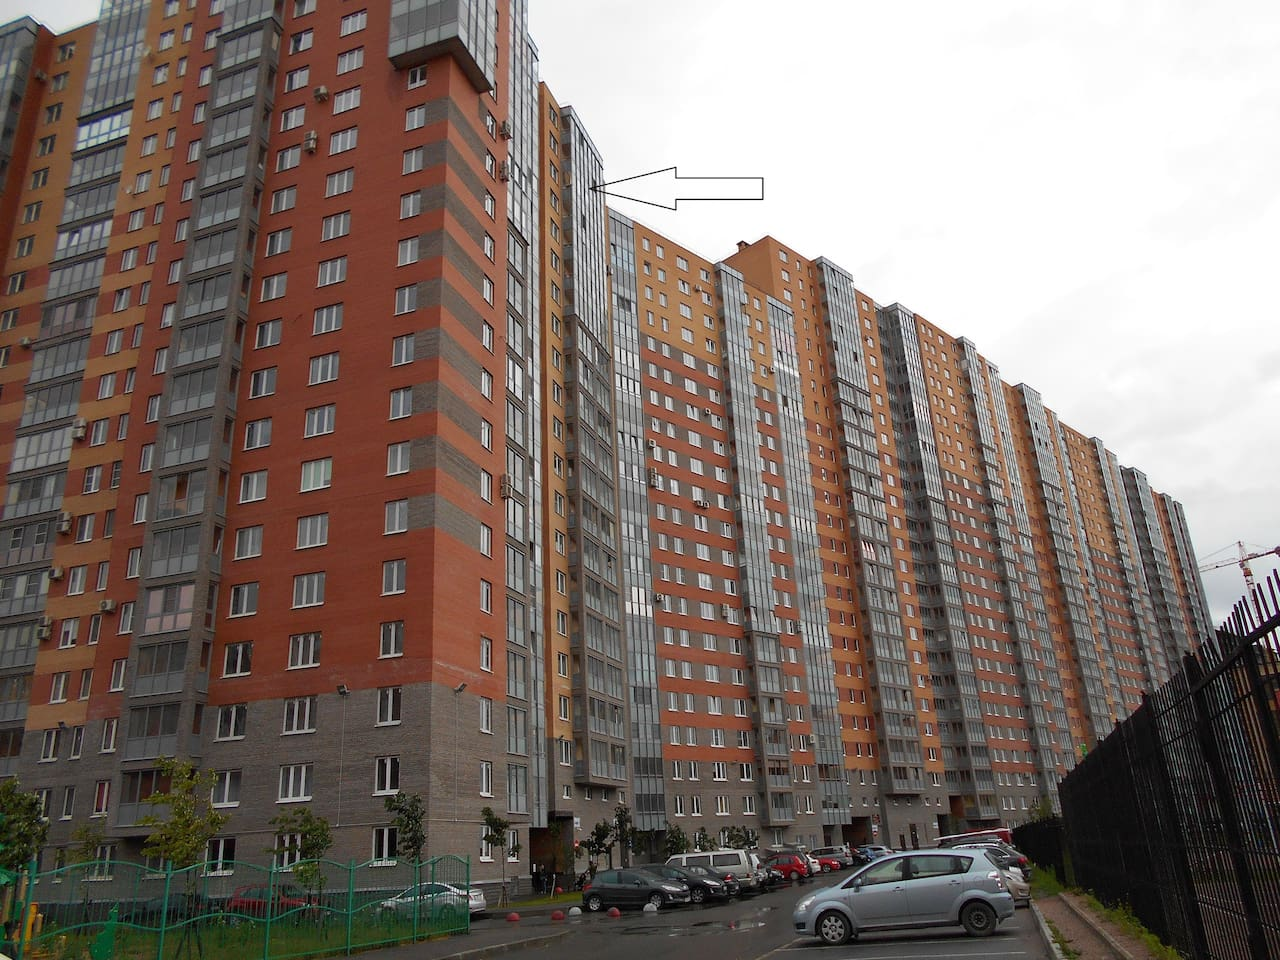 Однокомнатная квартира на 20 этаже.